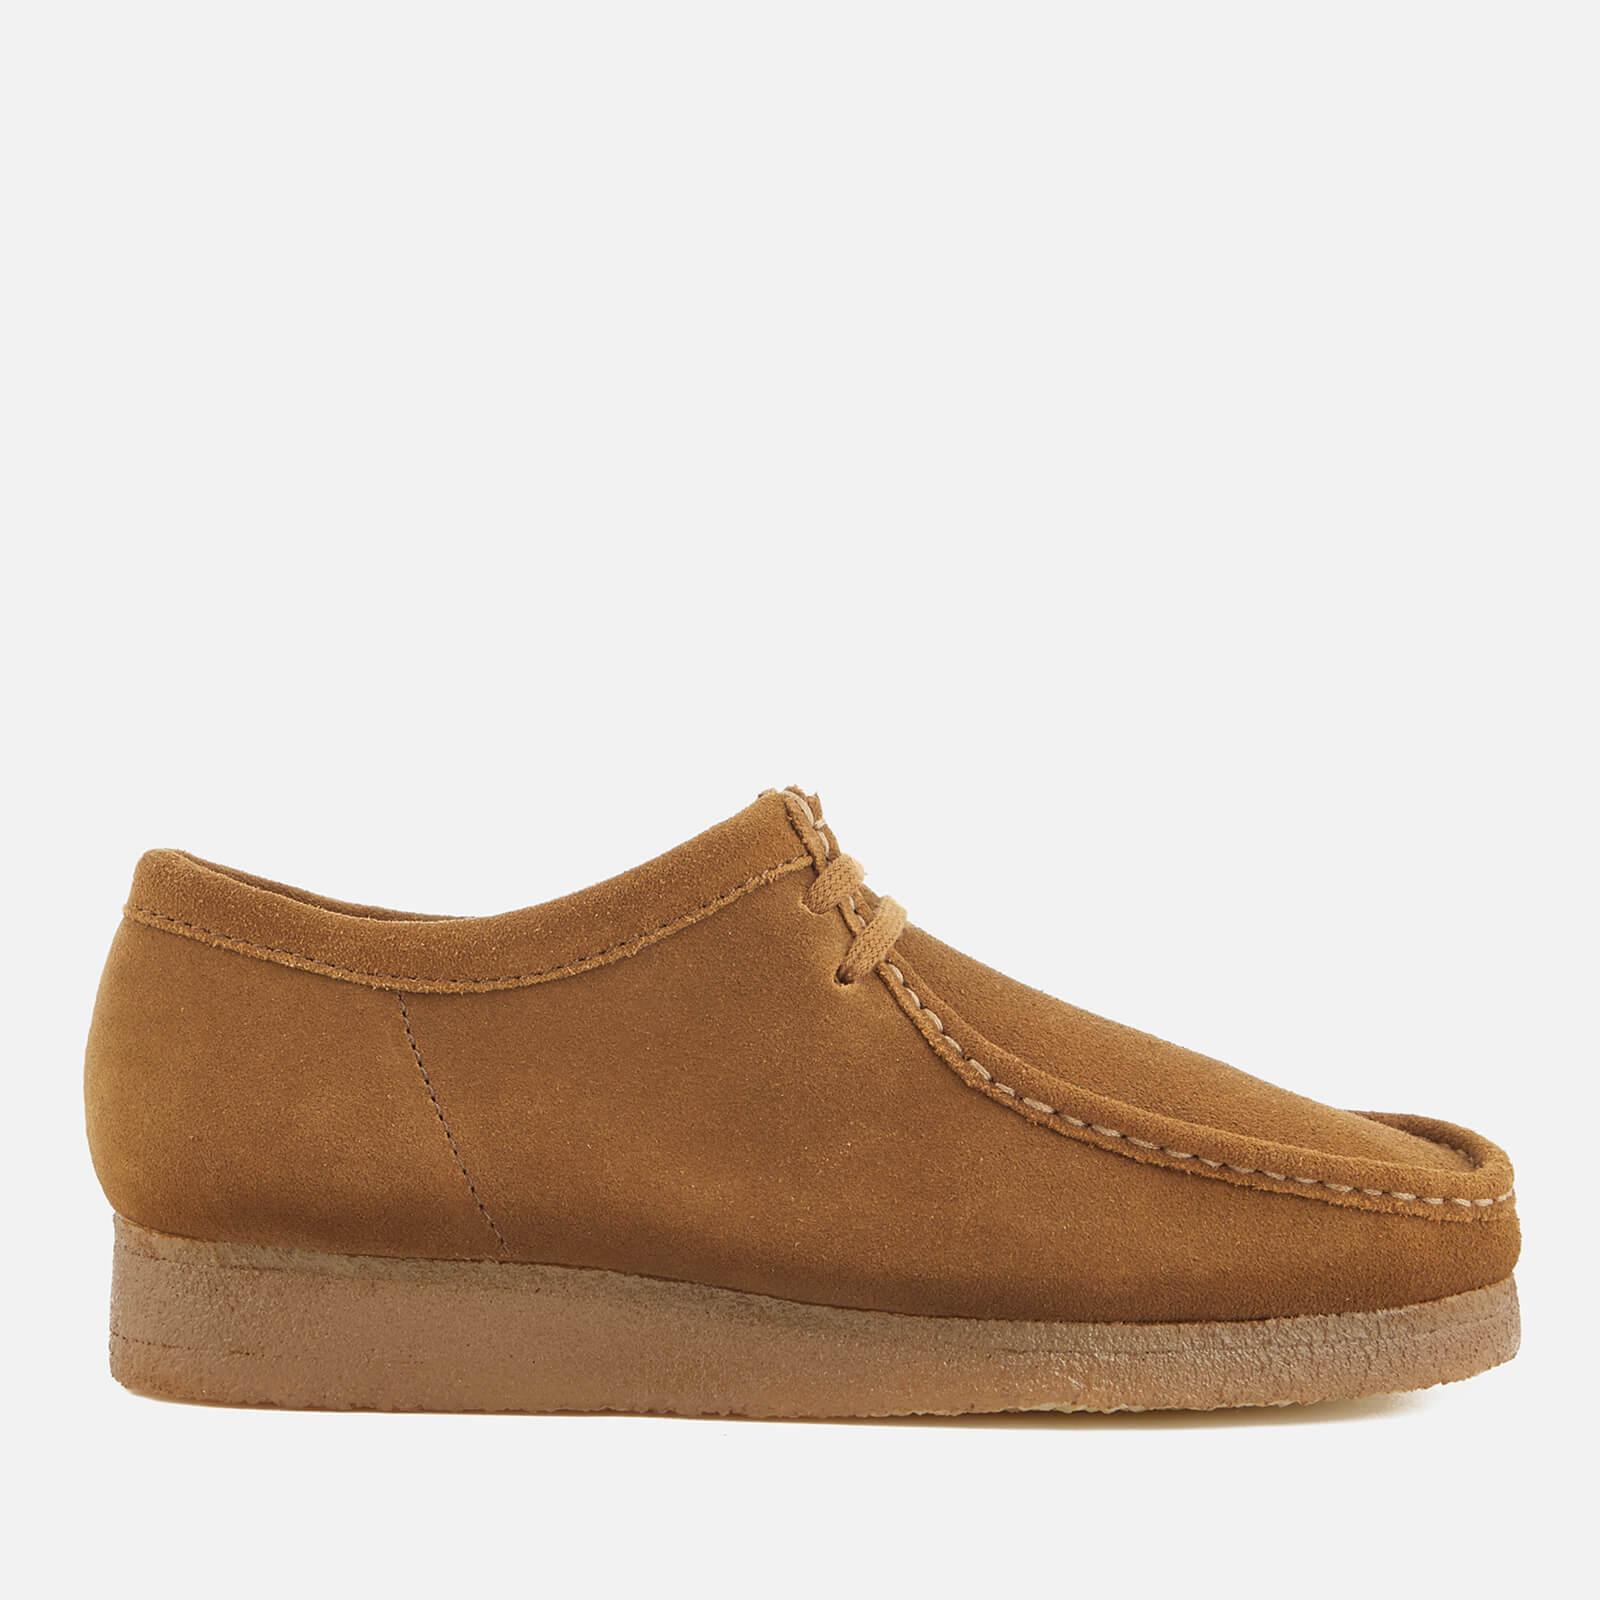 Clarks Originals Men's Wallabee Suede Shoes - Cola - UK 8 - Tan